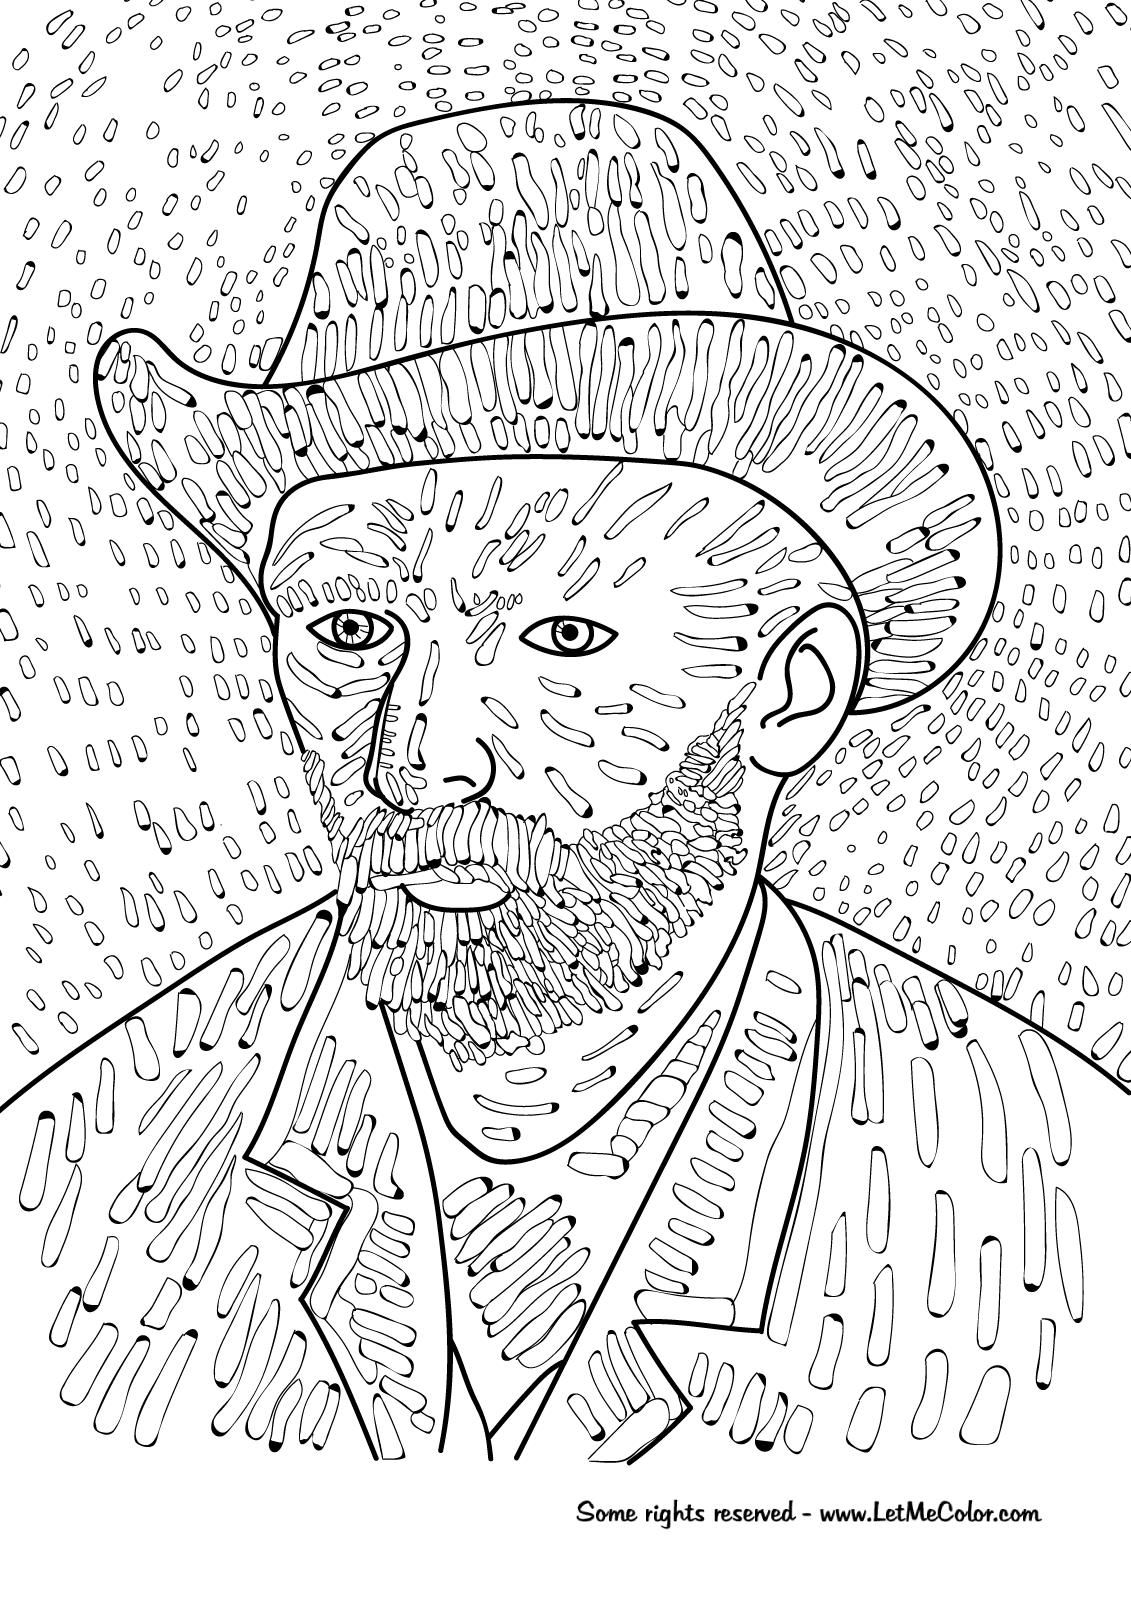 8 Coloring Page Van Gogh Van Gogh Coloring Van Gogh Self Portrait Coloring Pages